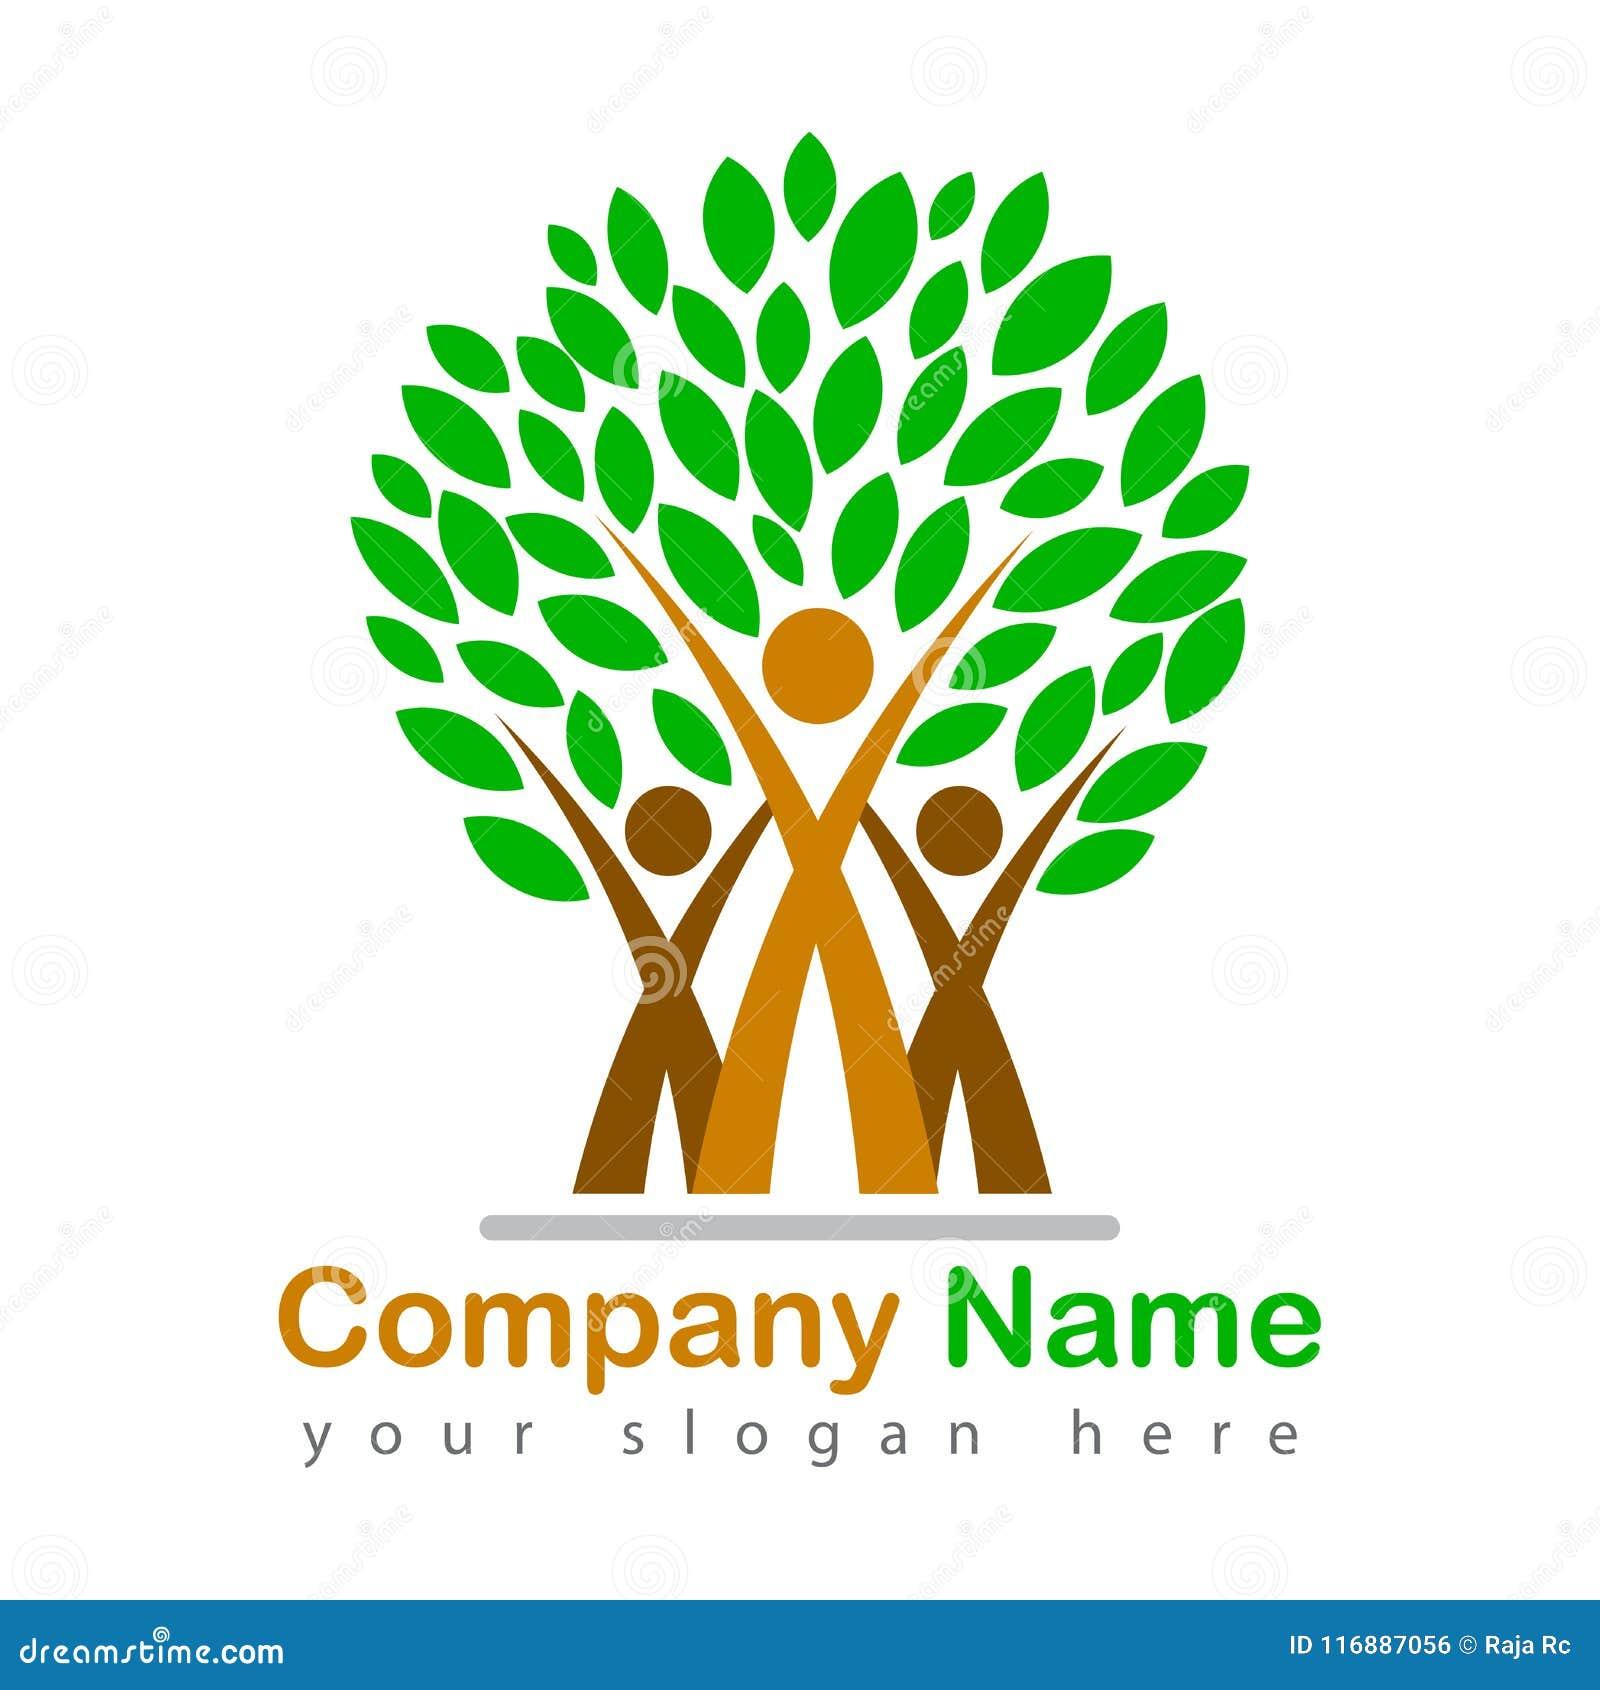 Счастливая amily иллюстрация логотипа дерева